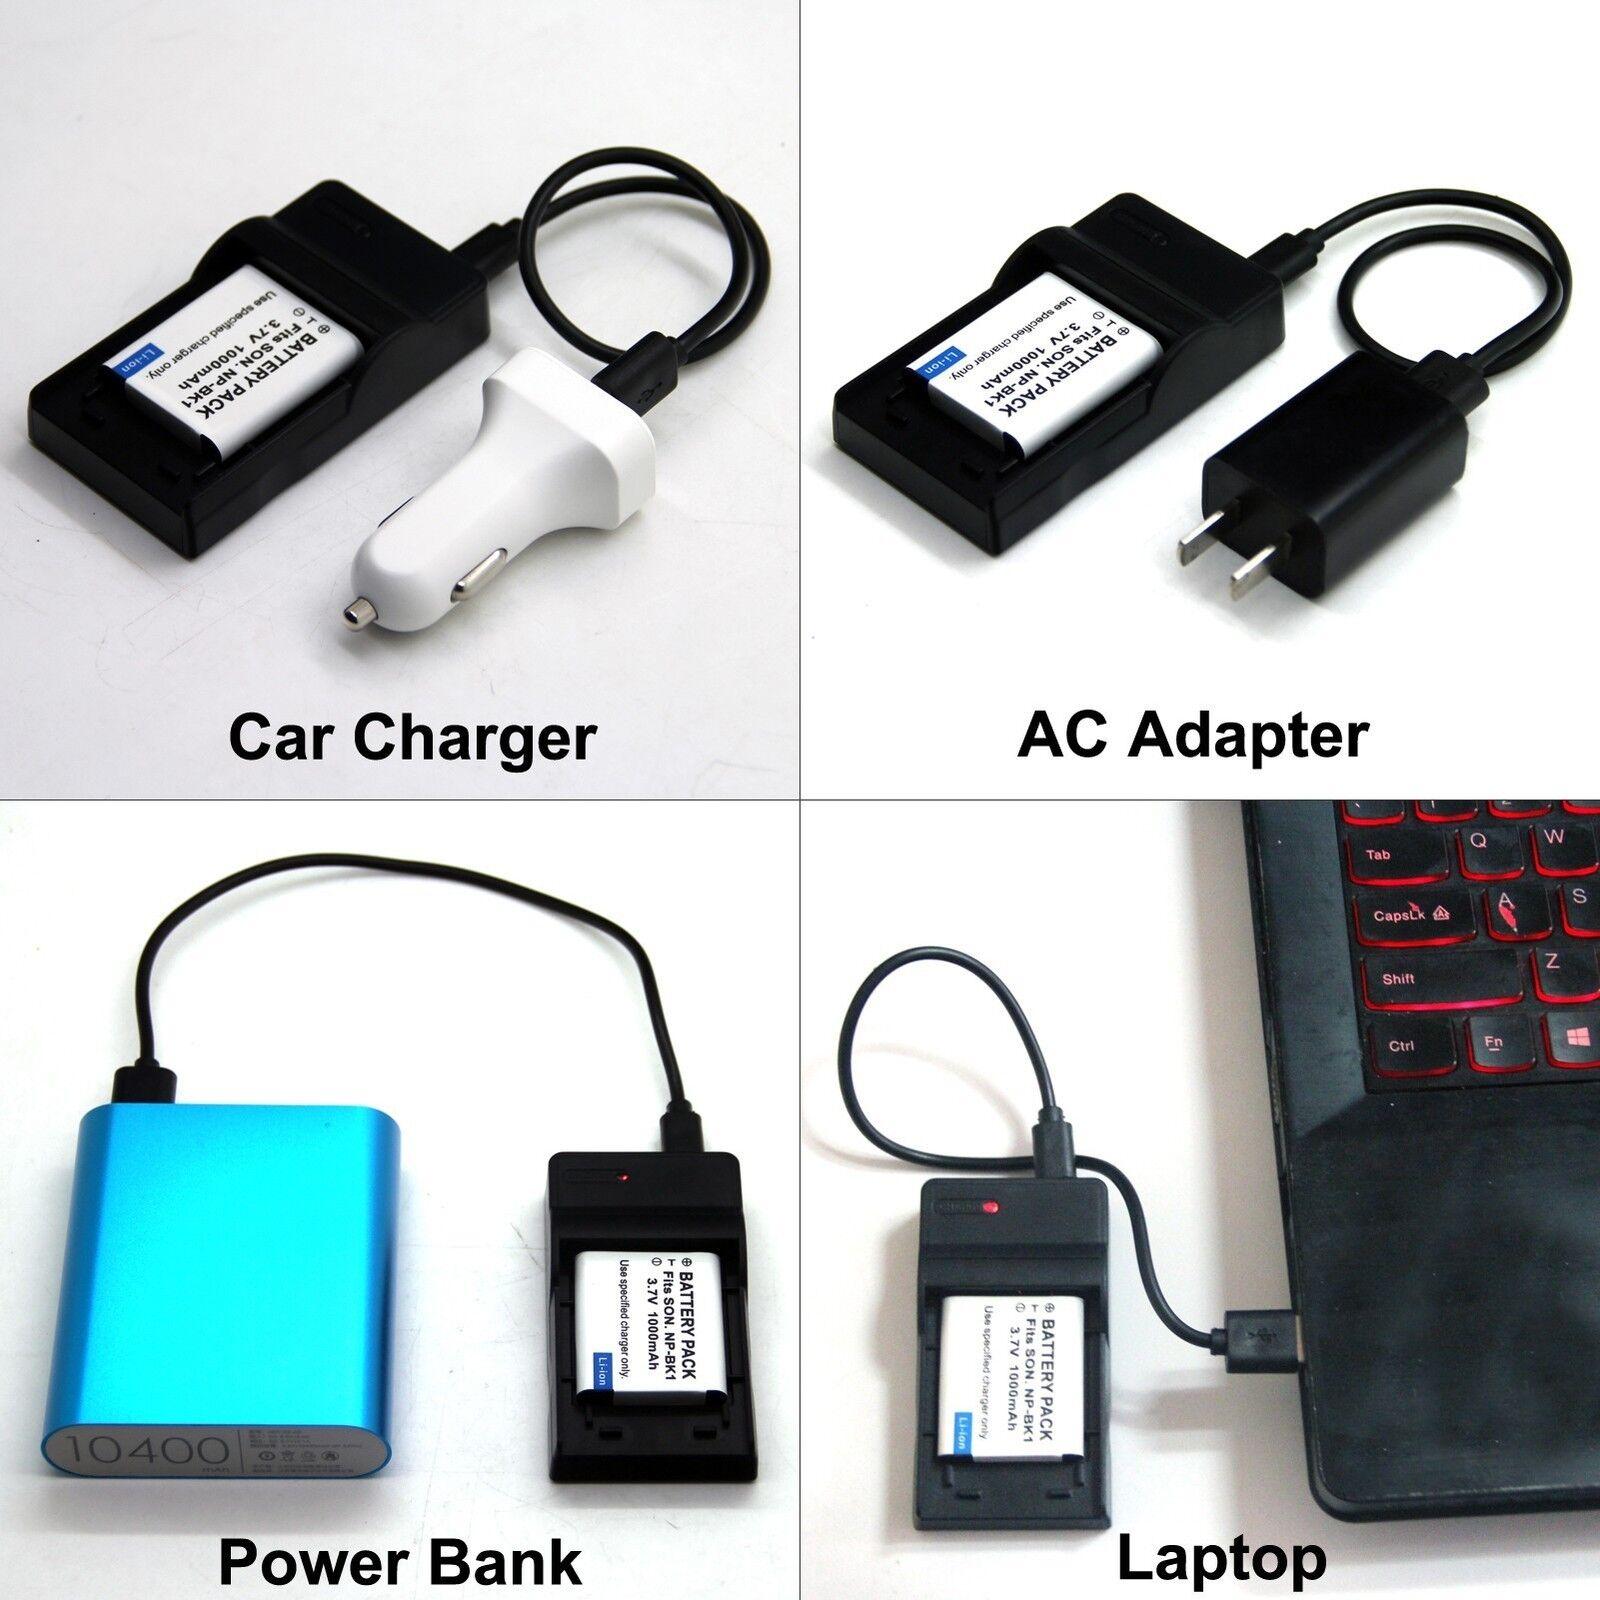 Car Adapter for Sanyo Xacti VPC-J1 EX Charger VPC-J2 EX VPC-AZ3 EX